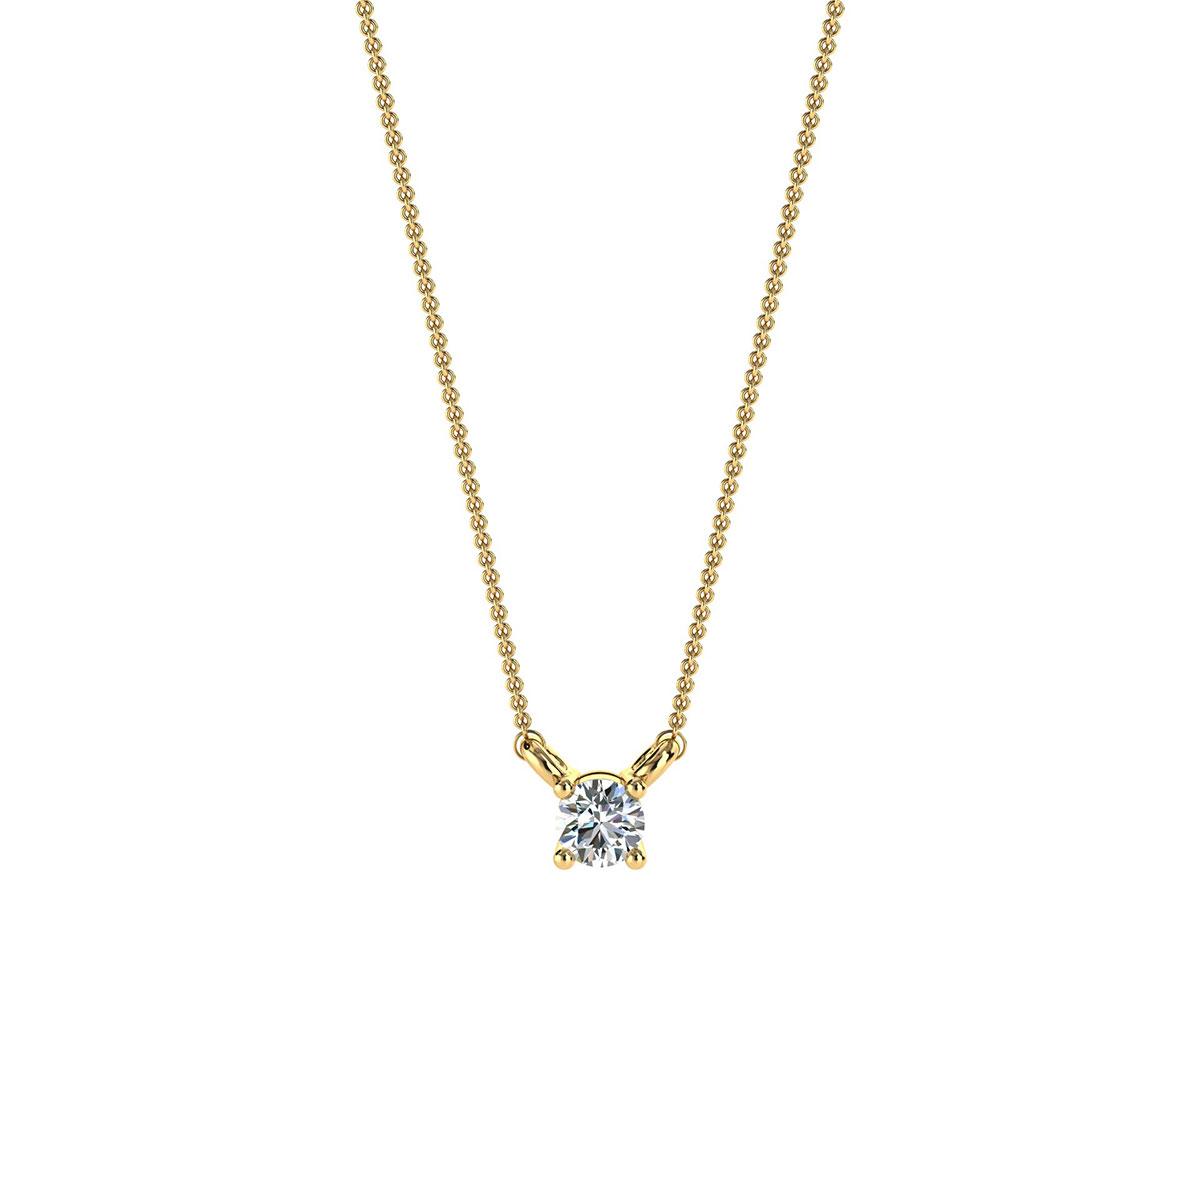 14K Yellow Gold Petite Four Prong Solitaire Diamond Pendant ( Center - 1/10 Carat)